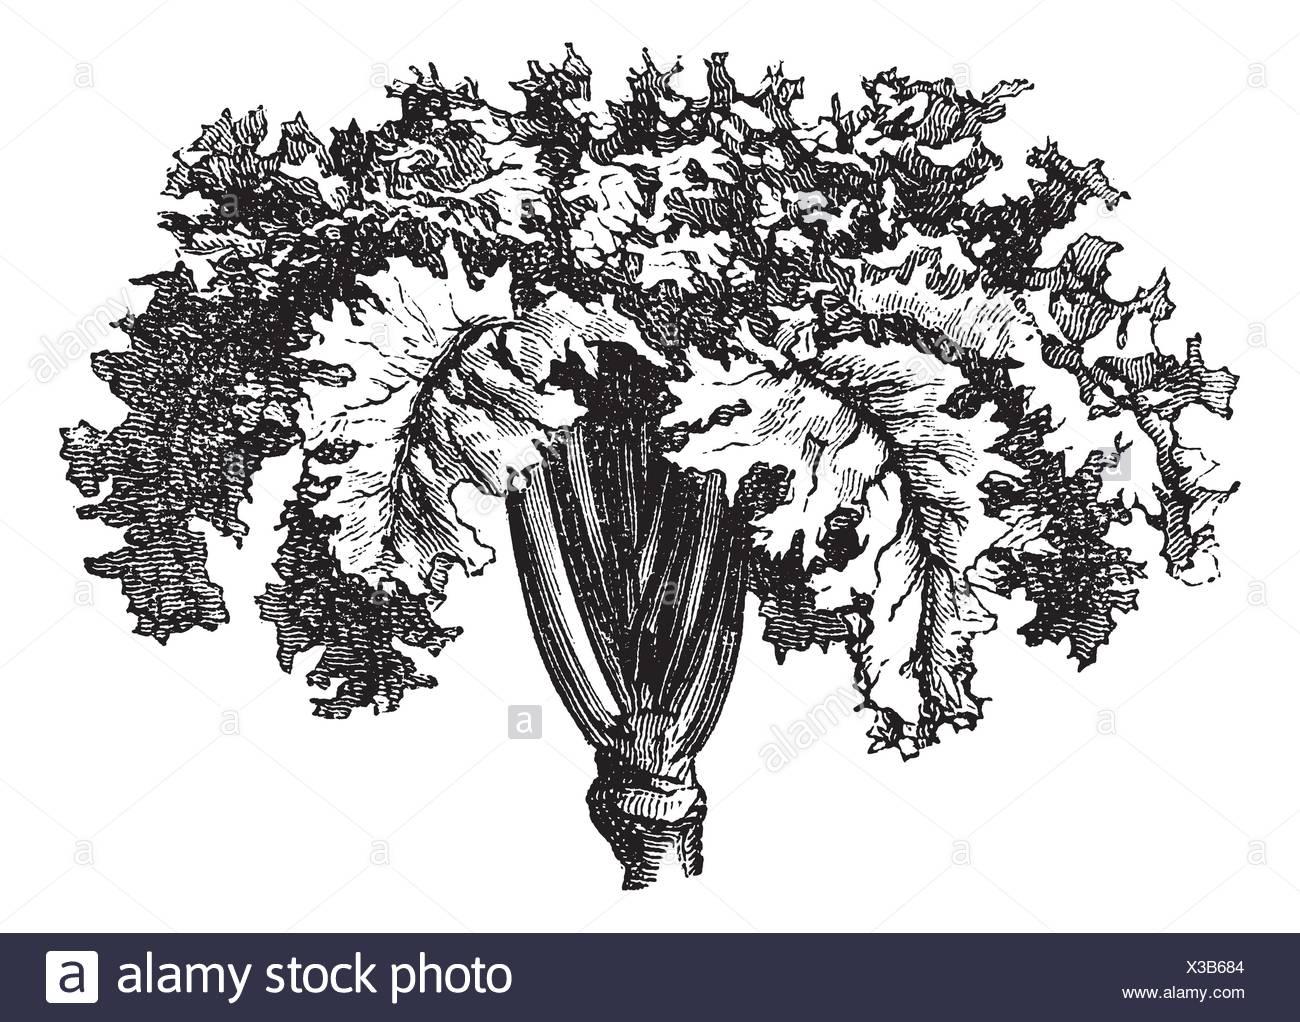 Rutabaga or Swedish Turnip or Yellow Turnip or Brassica napobrassica, vintage engraving  Old engraved illustration of a Rutabaga - Stock Image